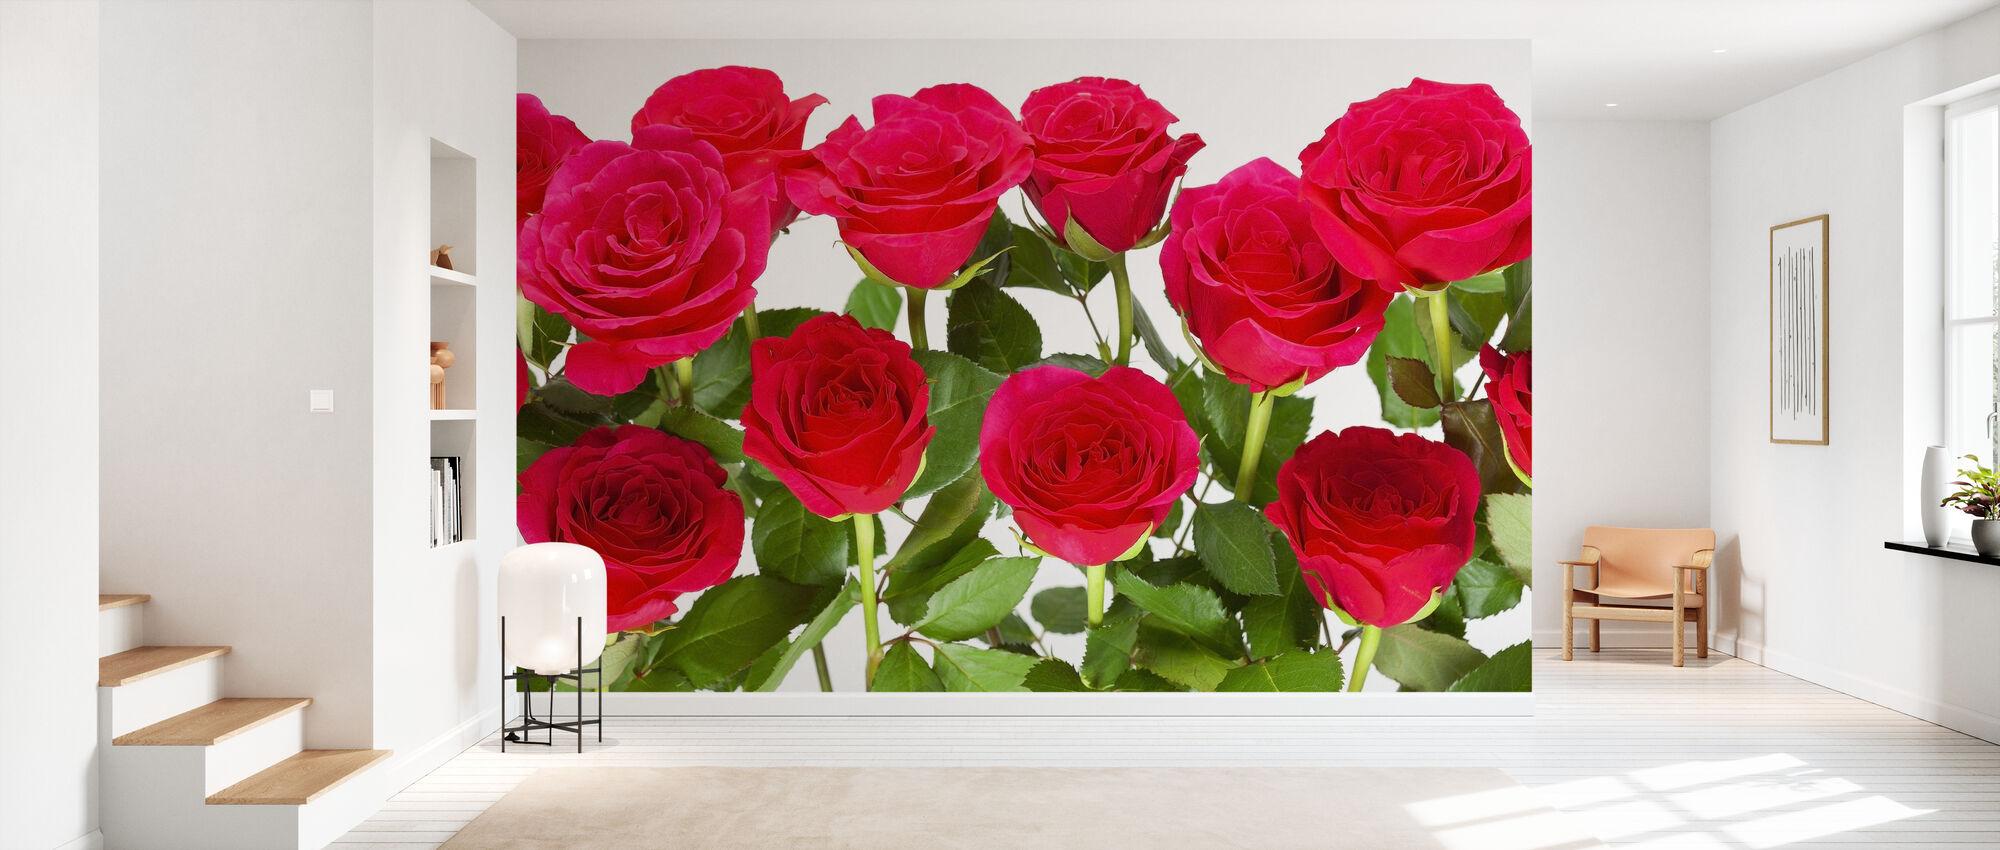 Red Roses - Wallpaper - Hallway